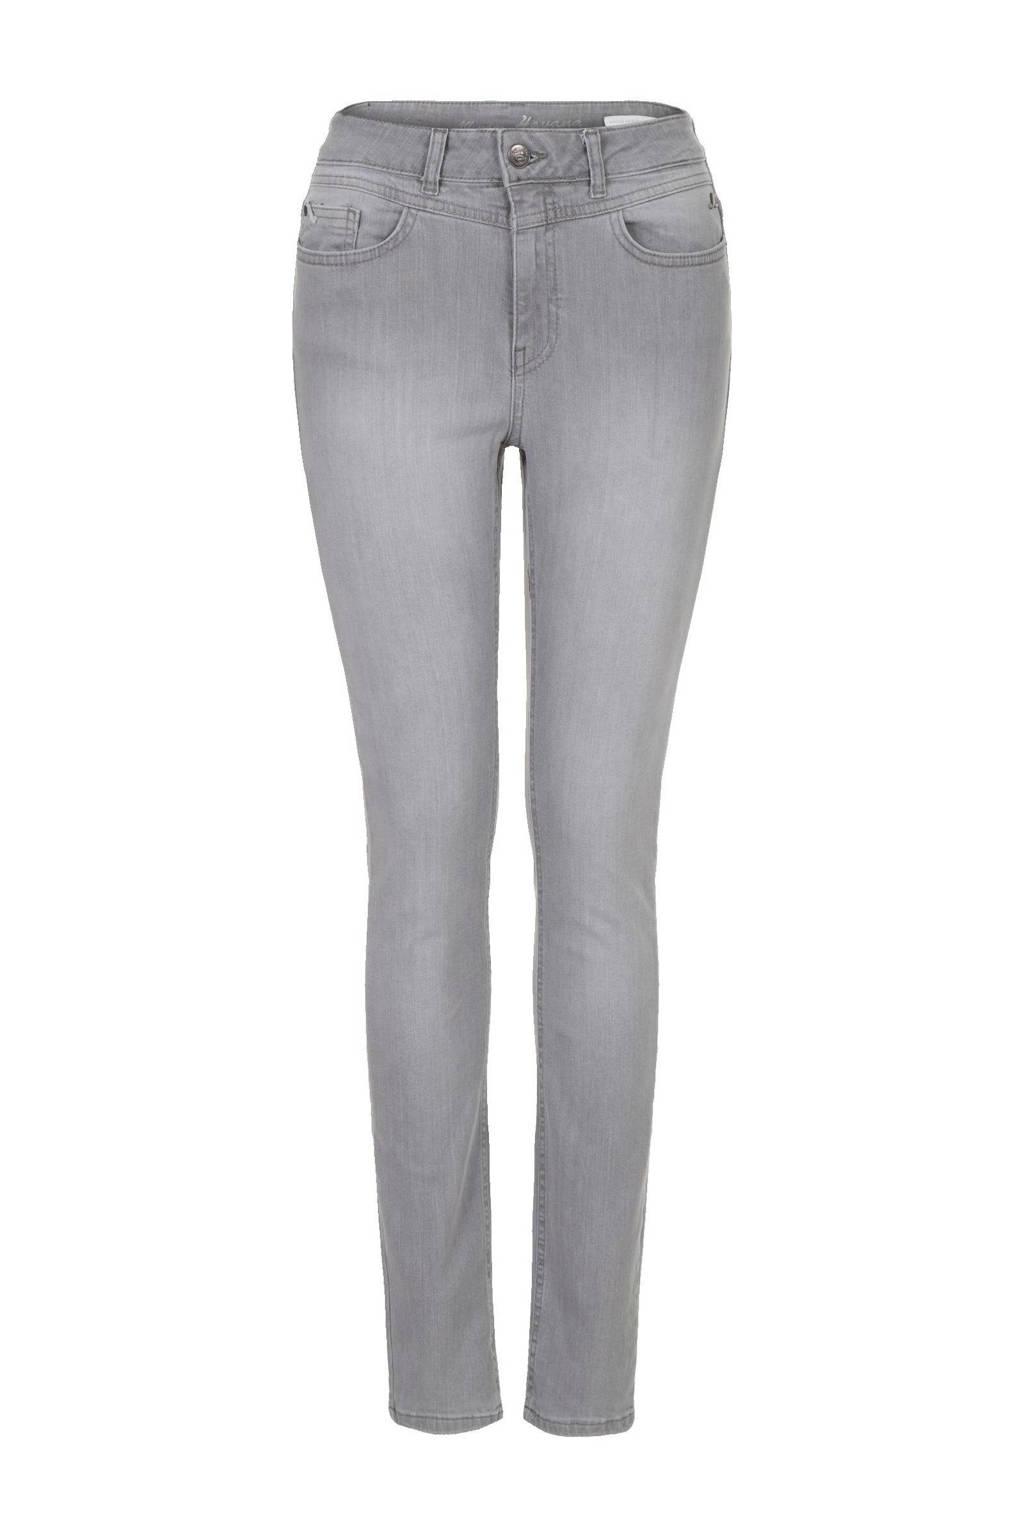 Miss Etam Regulier high waist slim fit jeans Havana grijs, Grijs